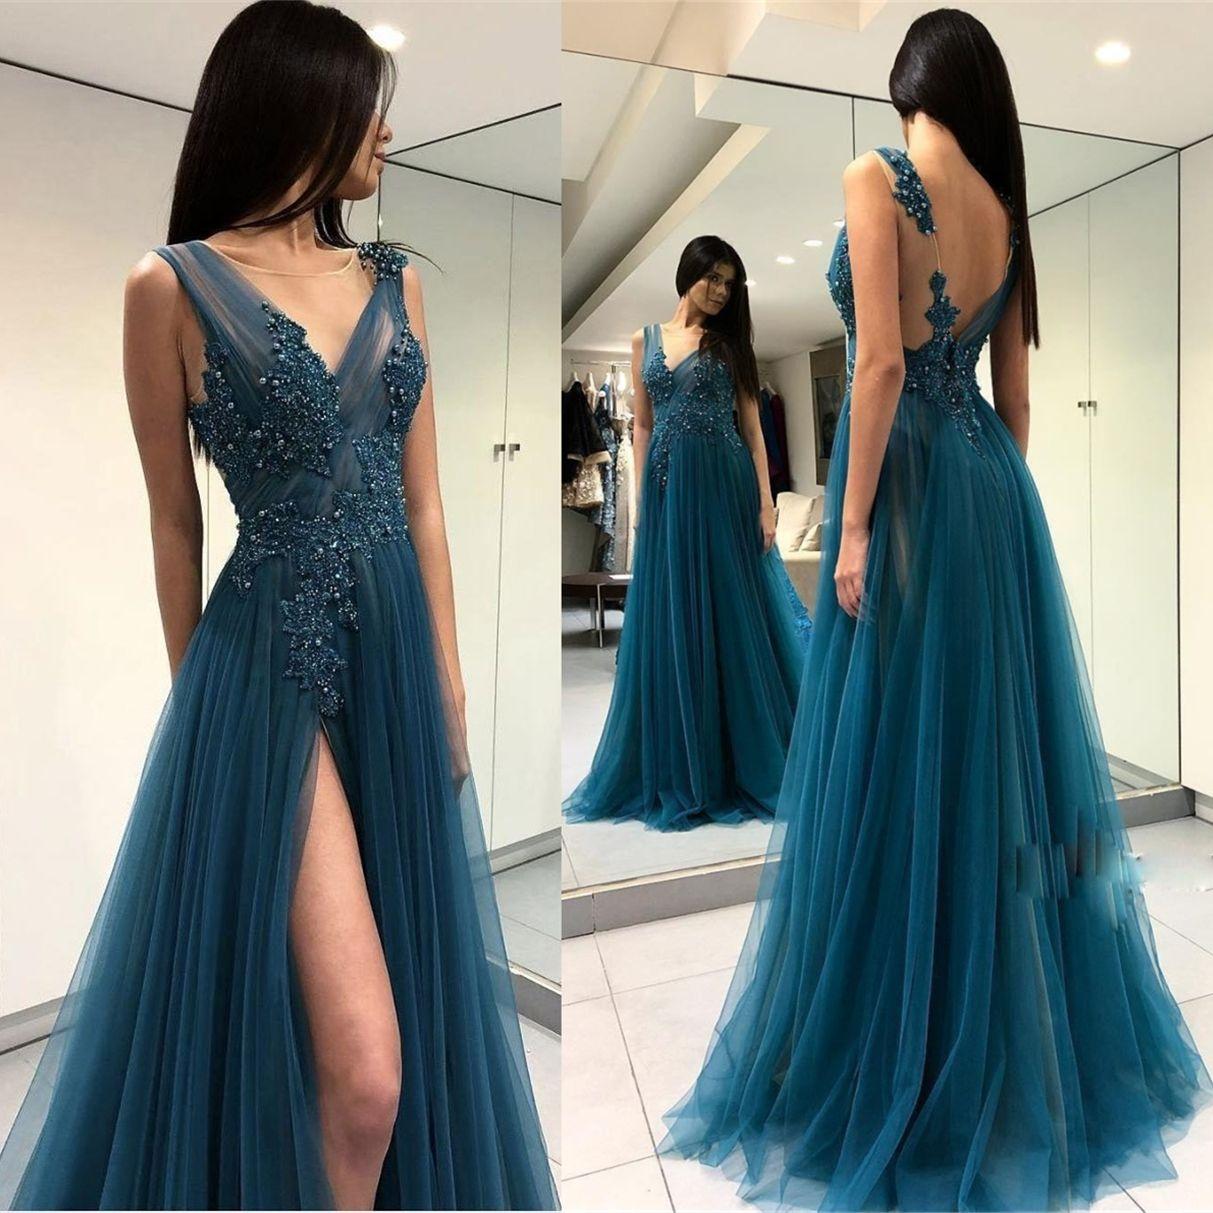 Discount Designer Dresses Cocktail: Cheap Prom Sweet 16 Dresses Long Sheer Scoop Backless